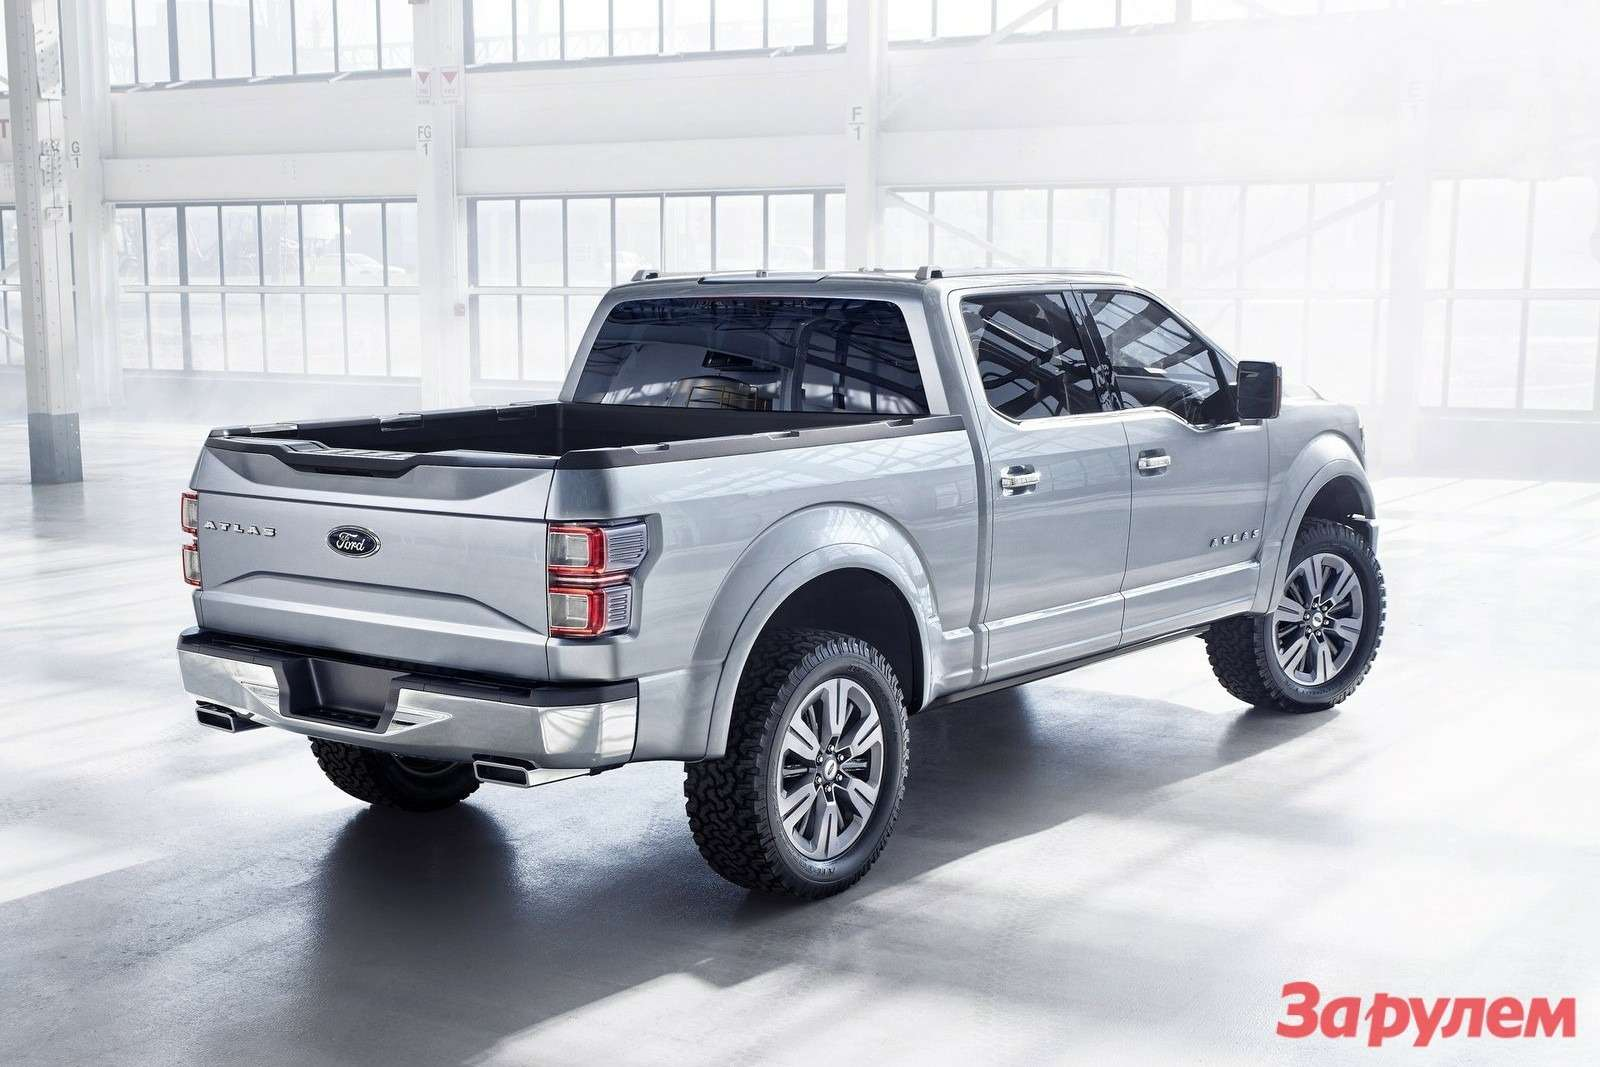 Ford-Atlas_Concept_2013_1600x1200_wallpaper_09